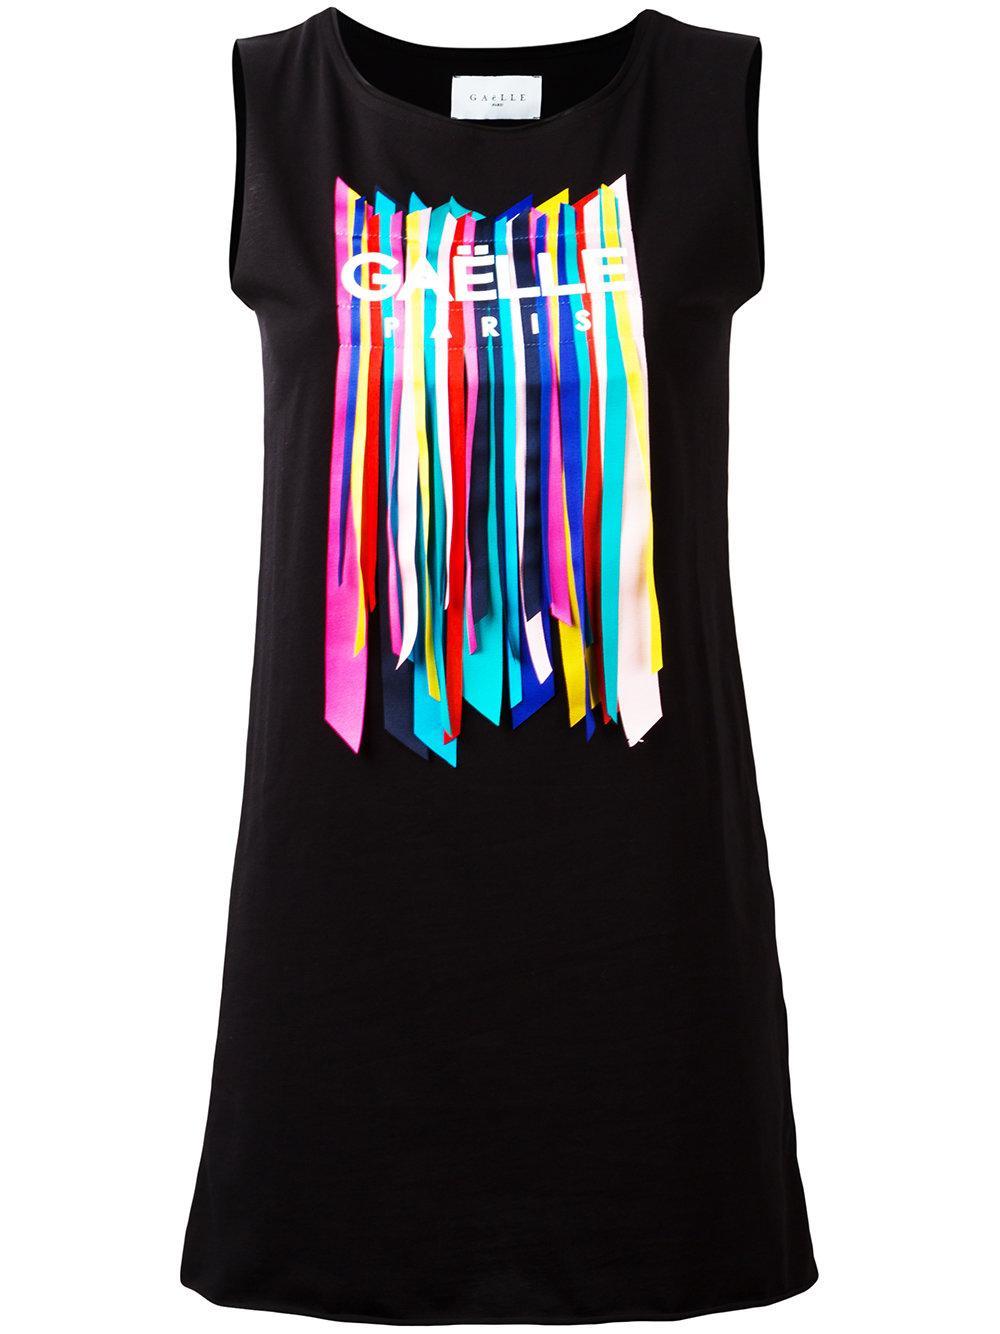 Gaëlle bonheur Embellished Sleeveless T-shirt in Black